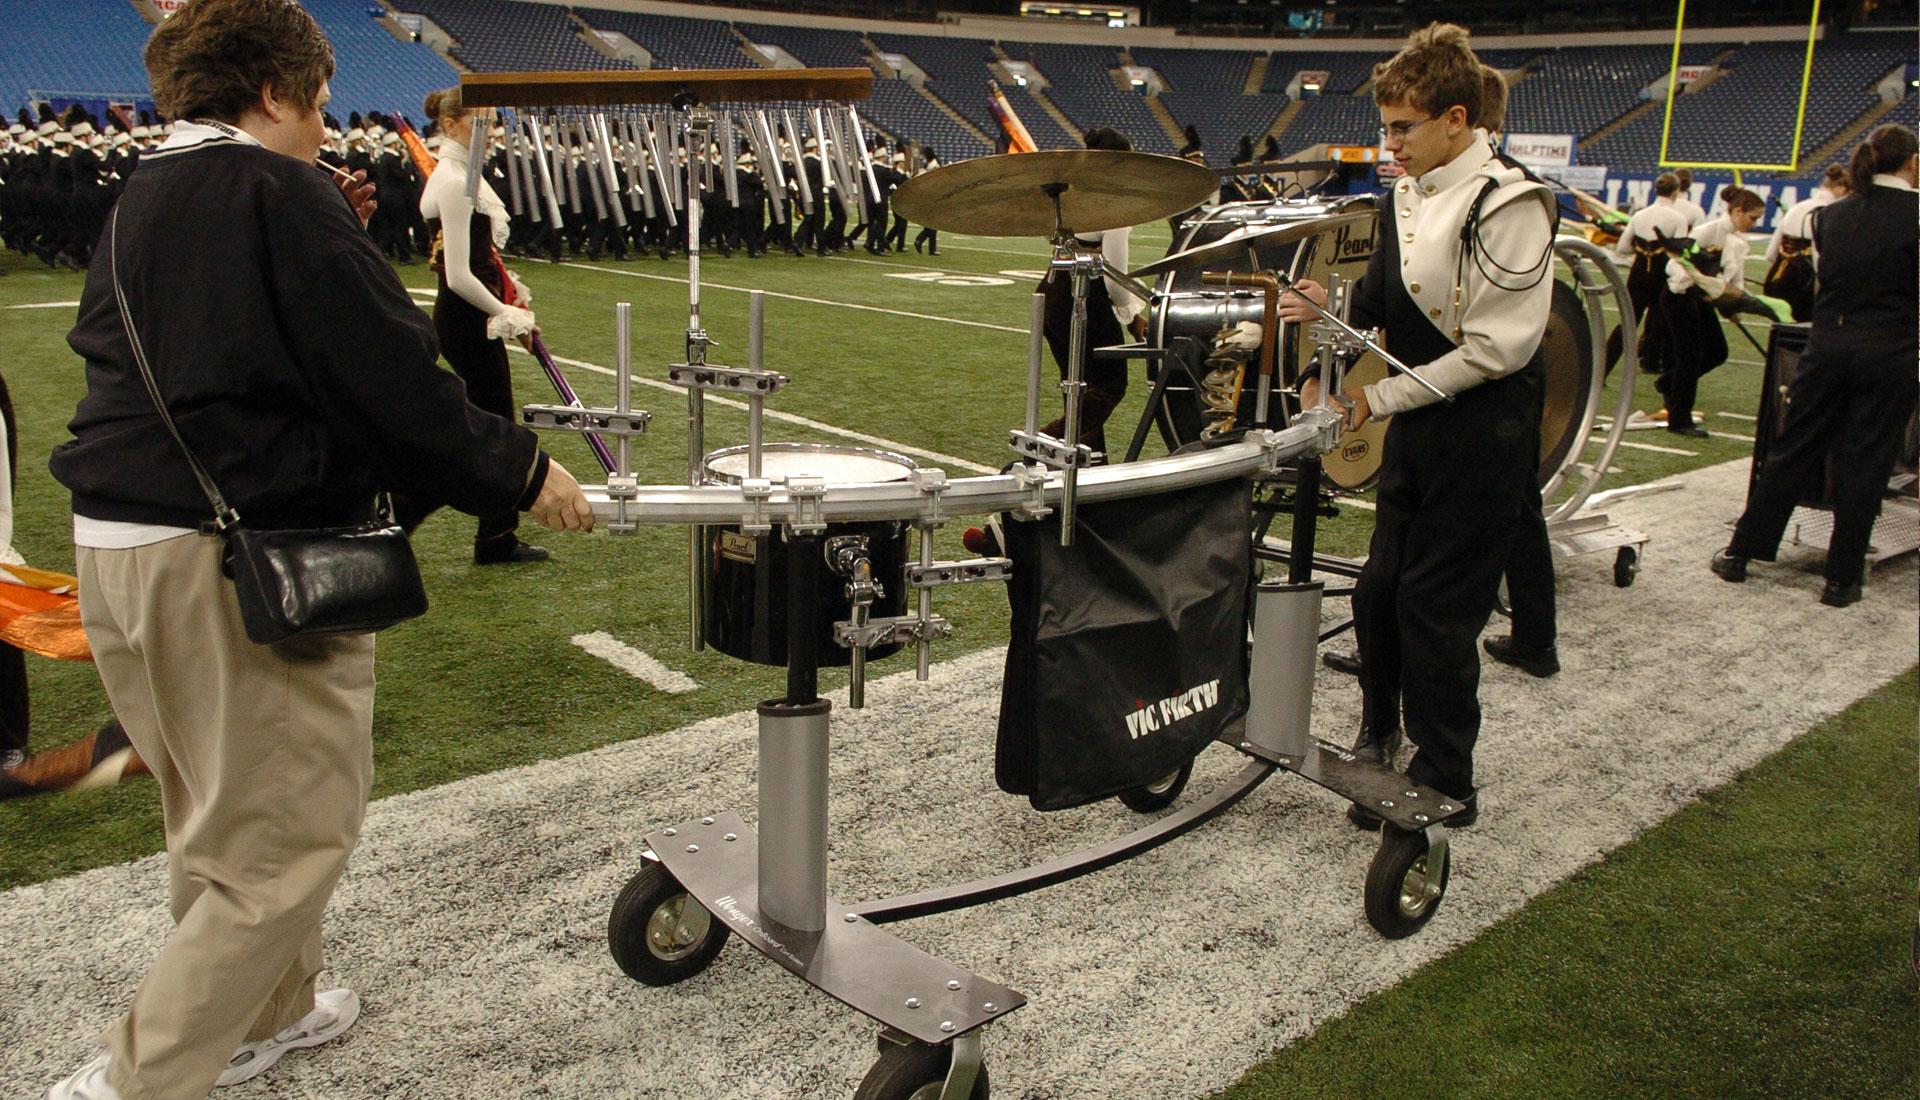 onboard percussion cart. Black Bedroom Furniture Sets. Home Design Ideas